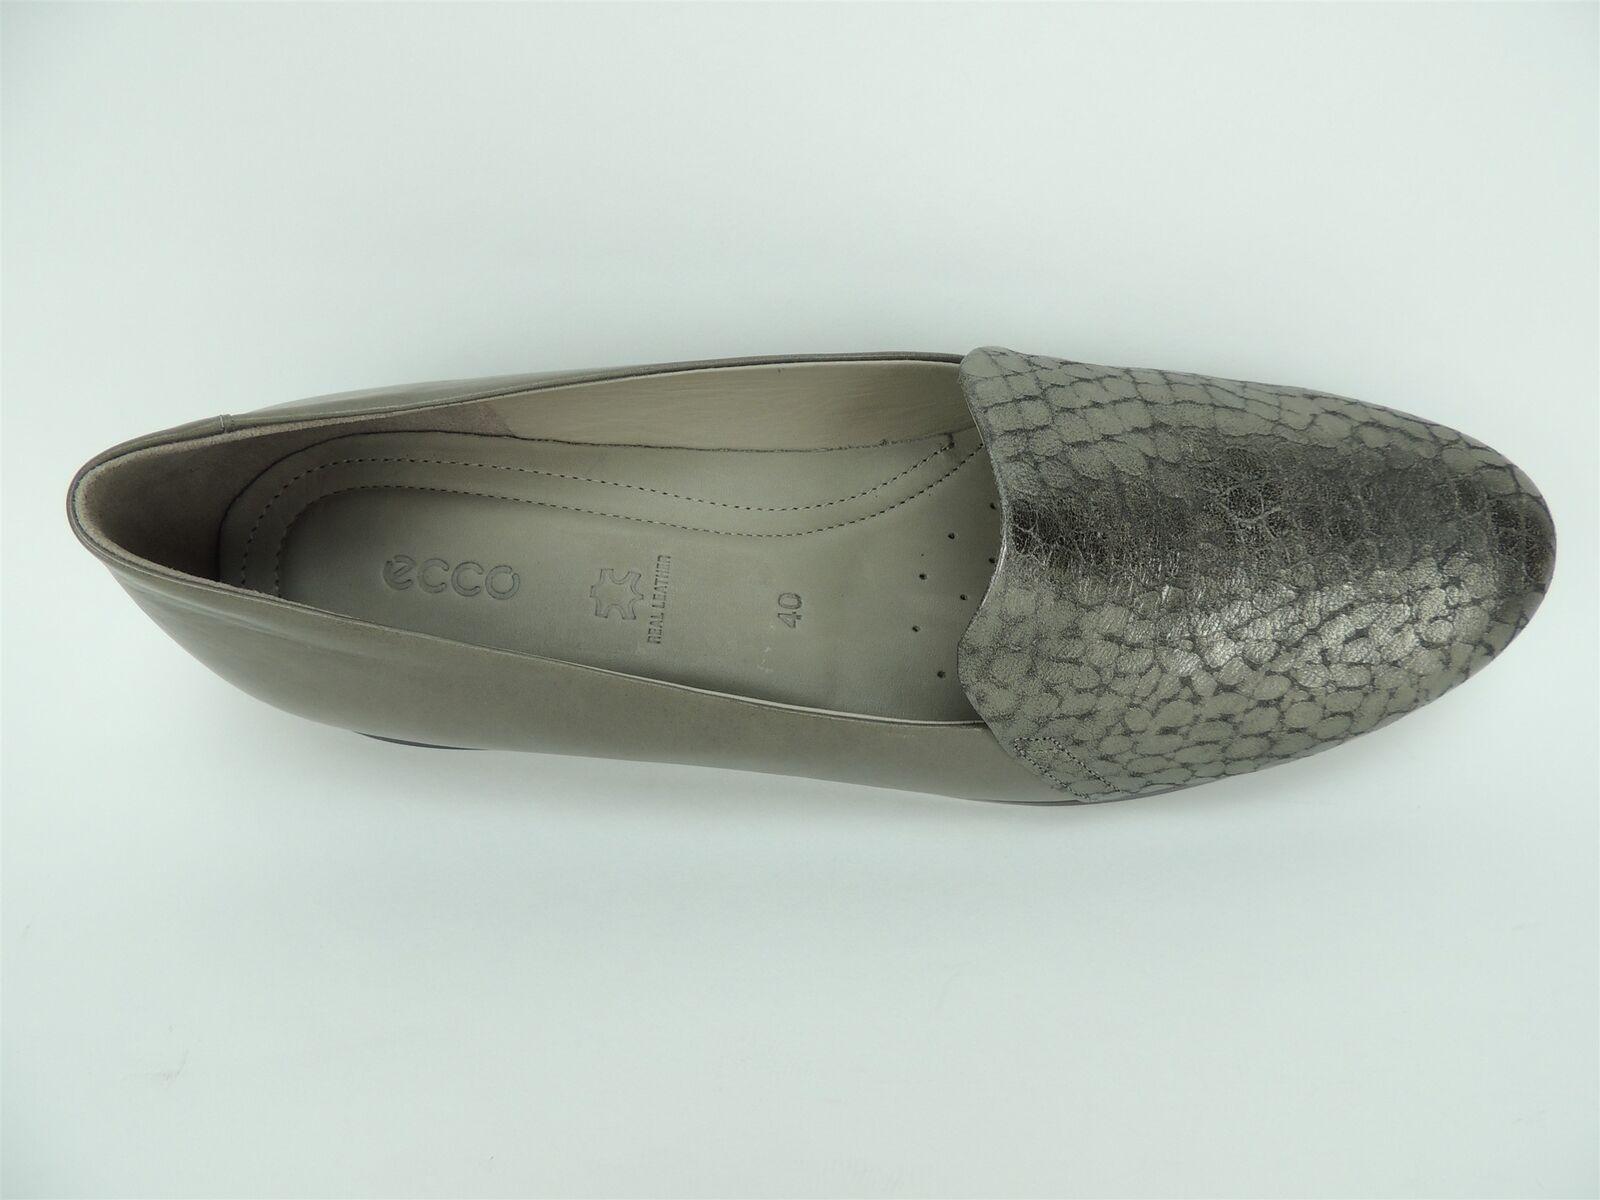 Ecco Women's Touch Ballerina 2.0 Flats Warm Grey Grey Grey Leather Size US 9-9.5 EU 40 c6f57d